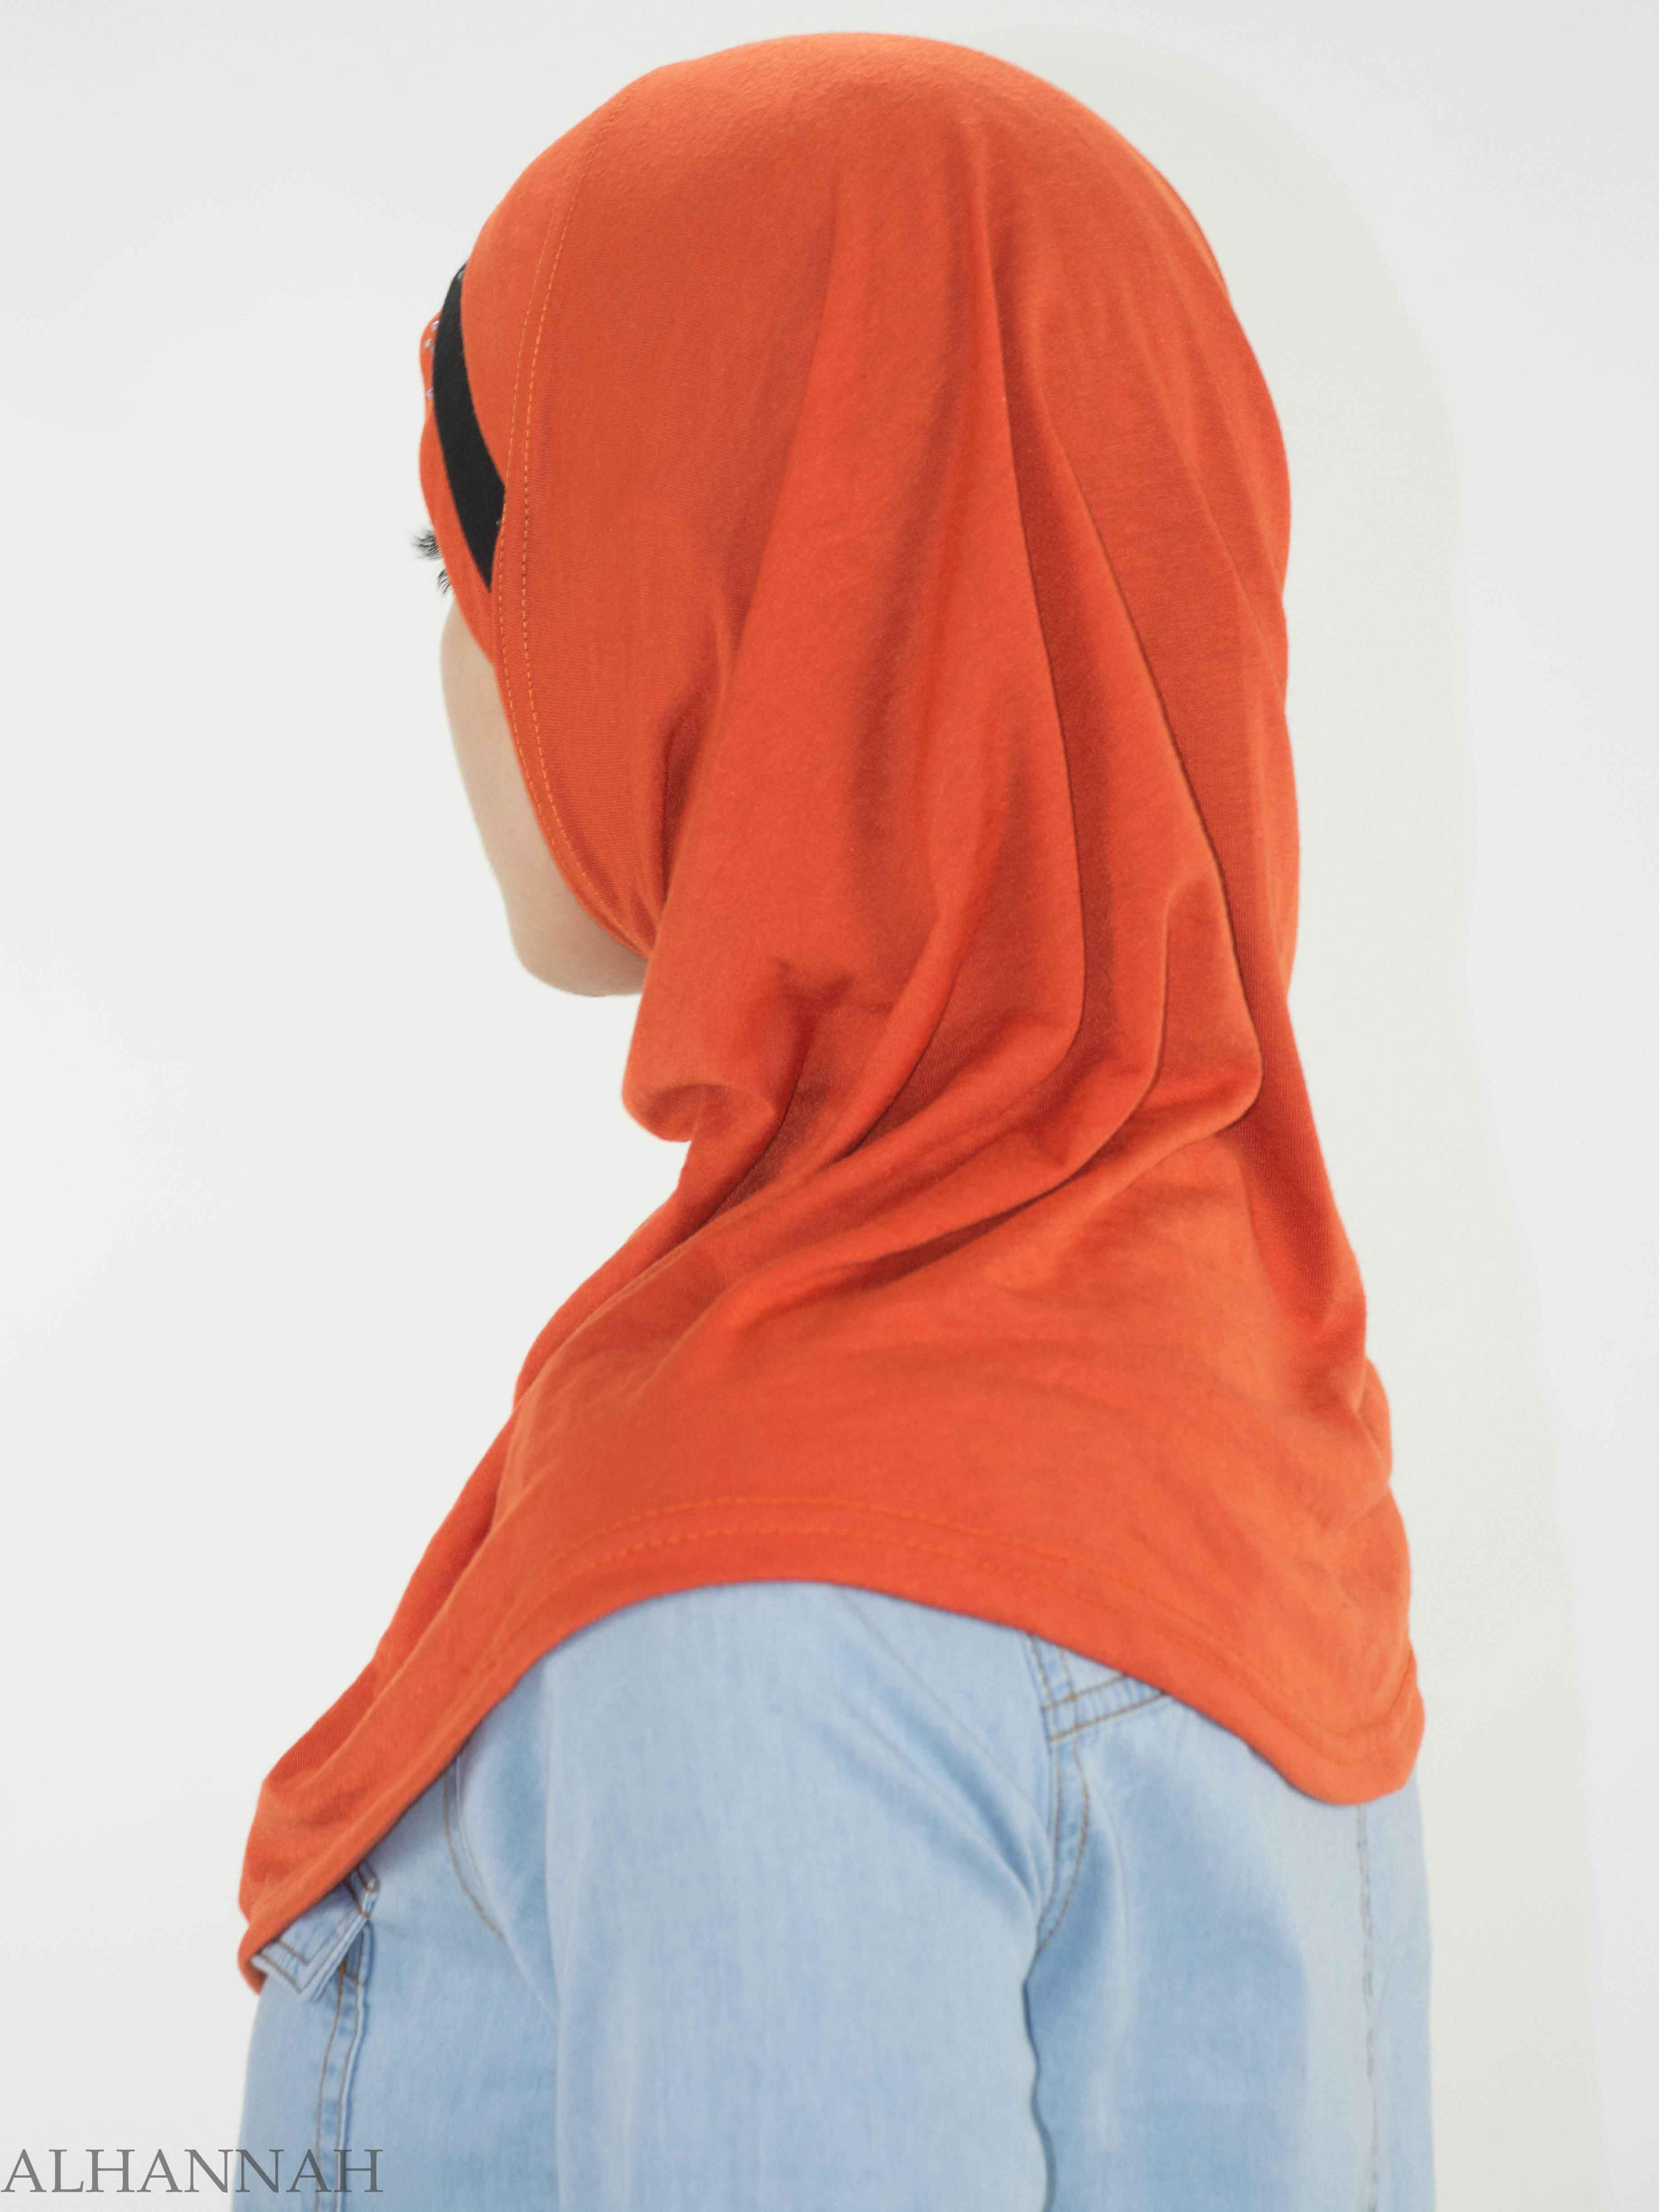 Rhinestone Striped One-Piece Al-Amira Hijab HI2135 (3)